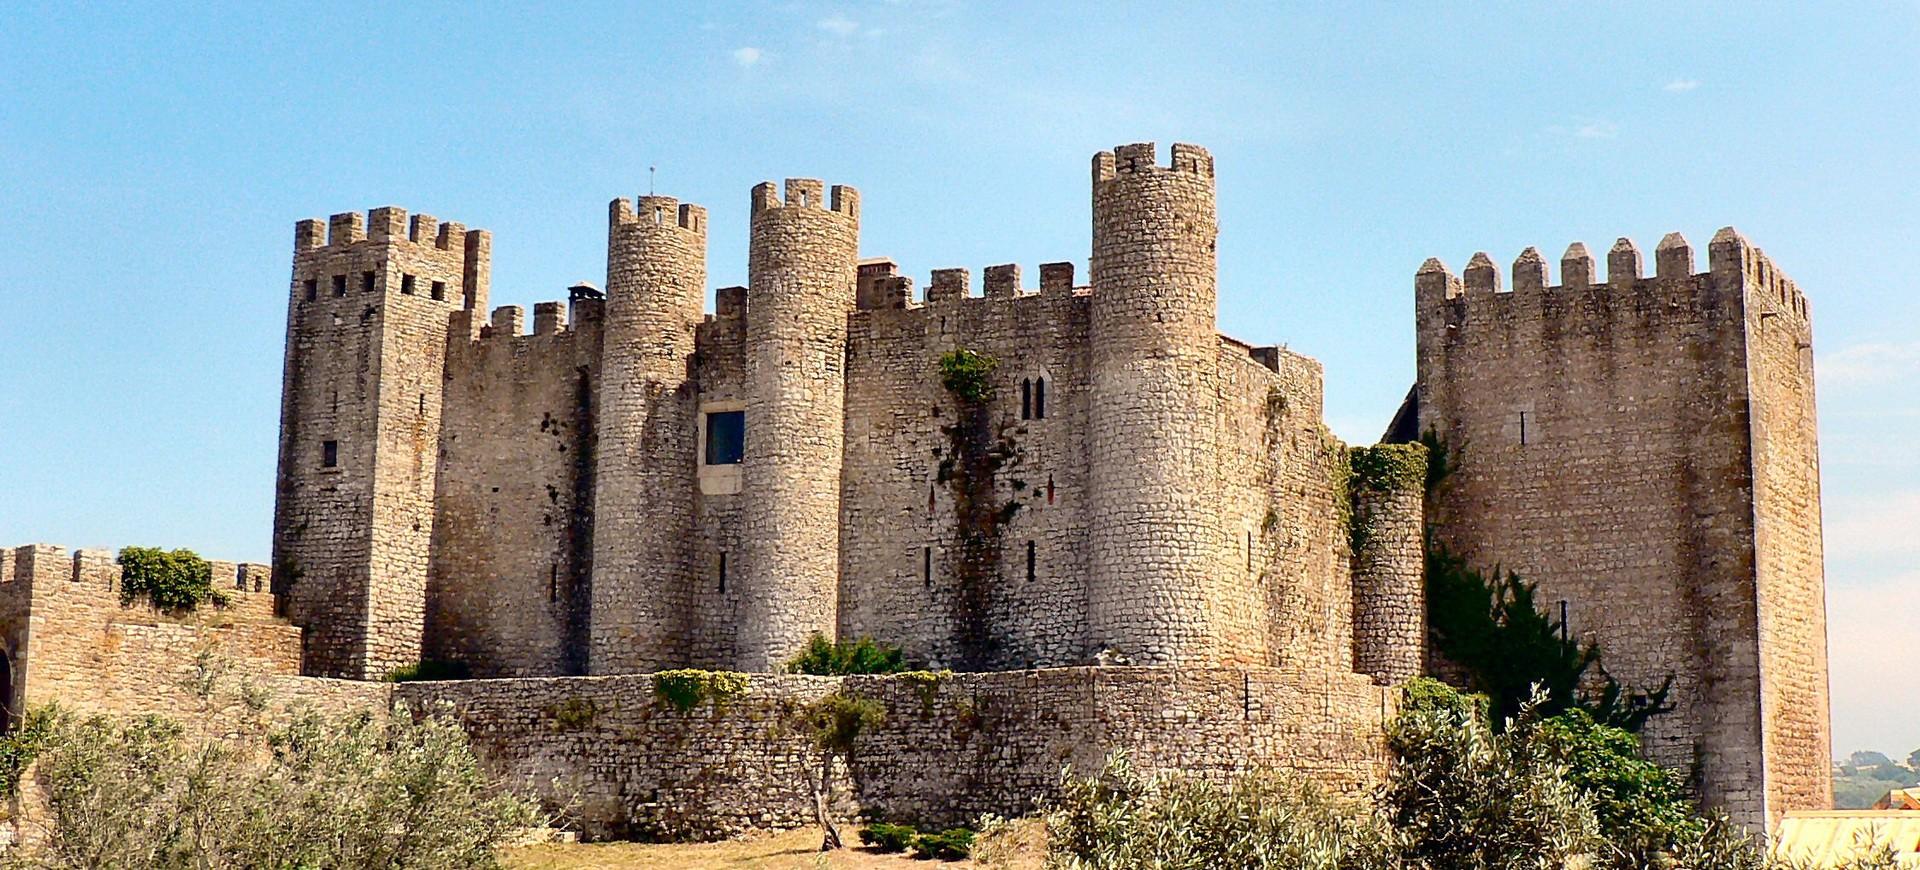 Chateau Obidos dans la village mediéval Obidos